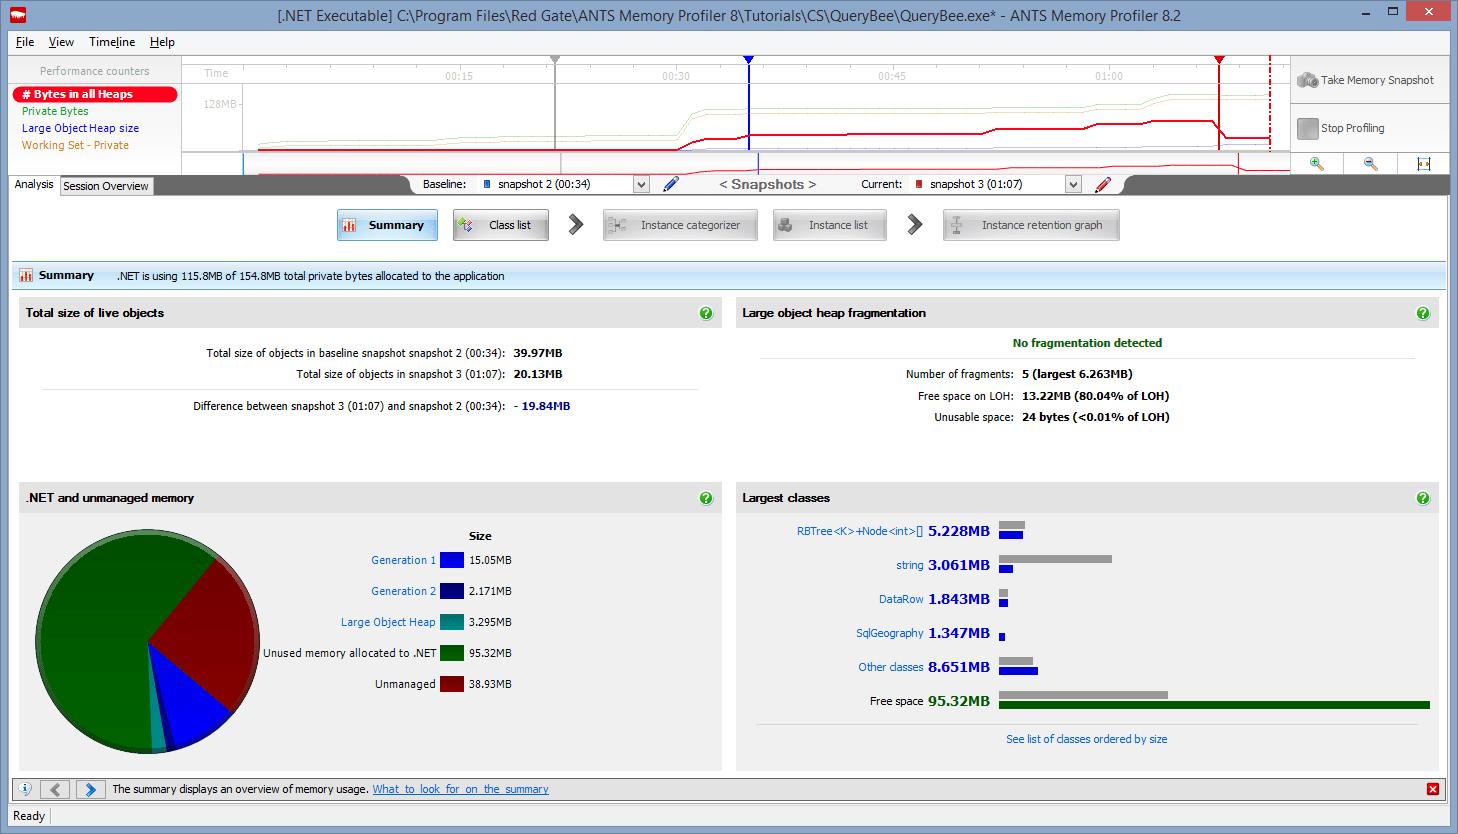 NET Memory Profiler By Redgate   ANTS Memory Profiler